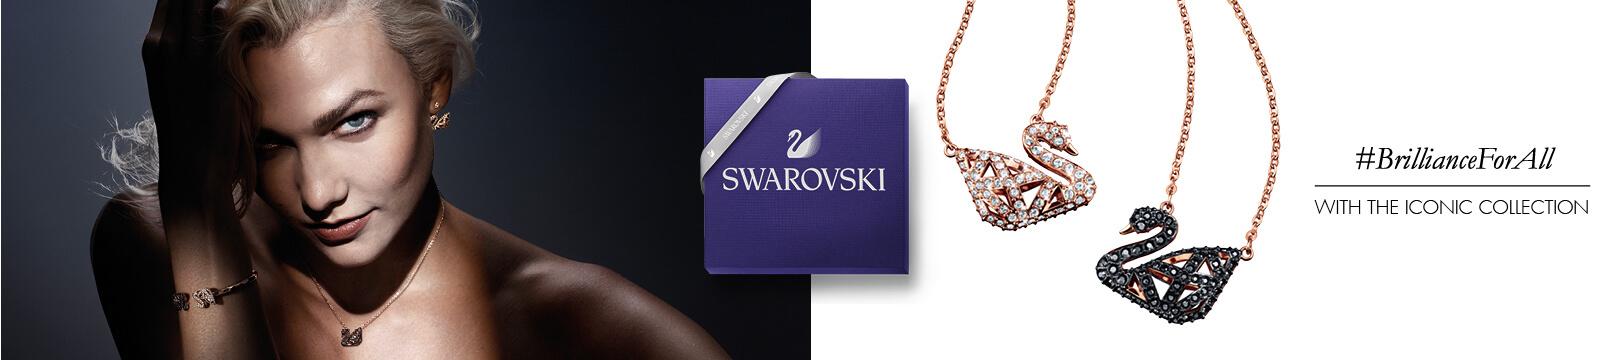 swarovski-header-2018